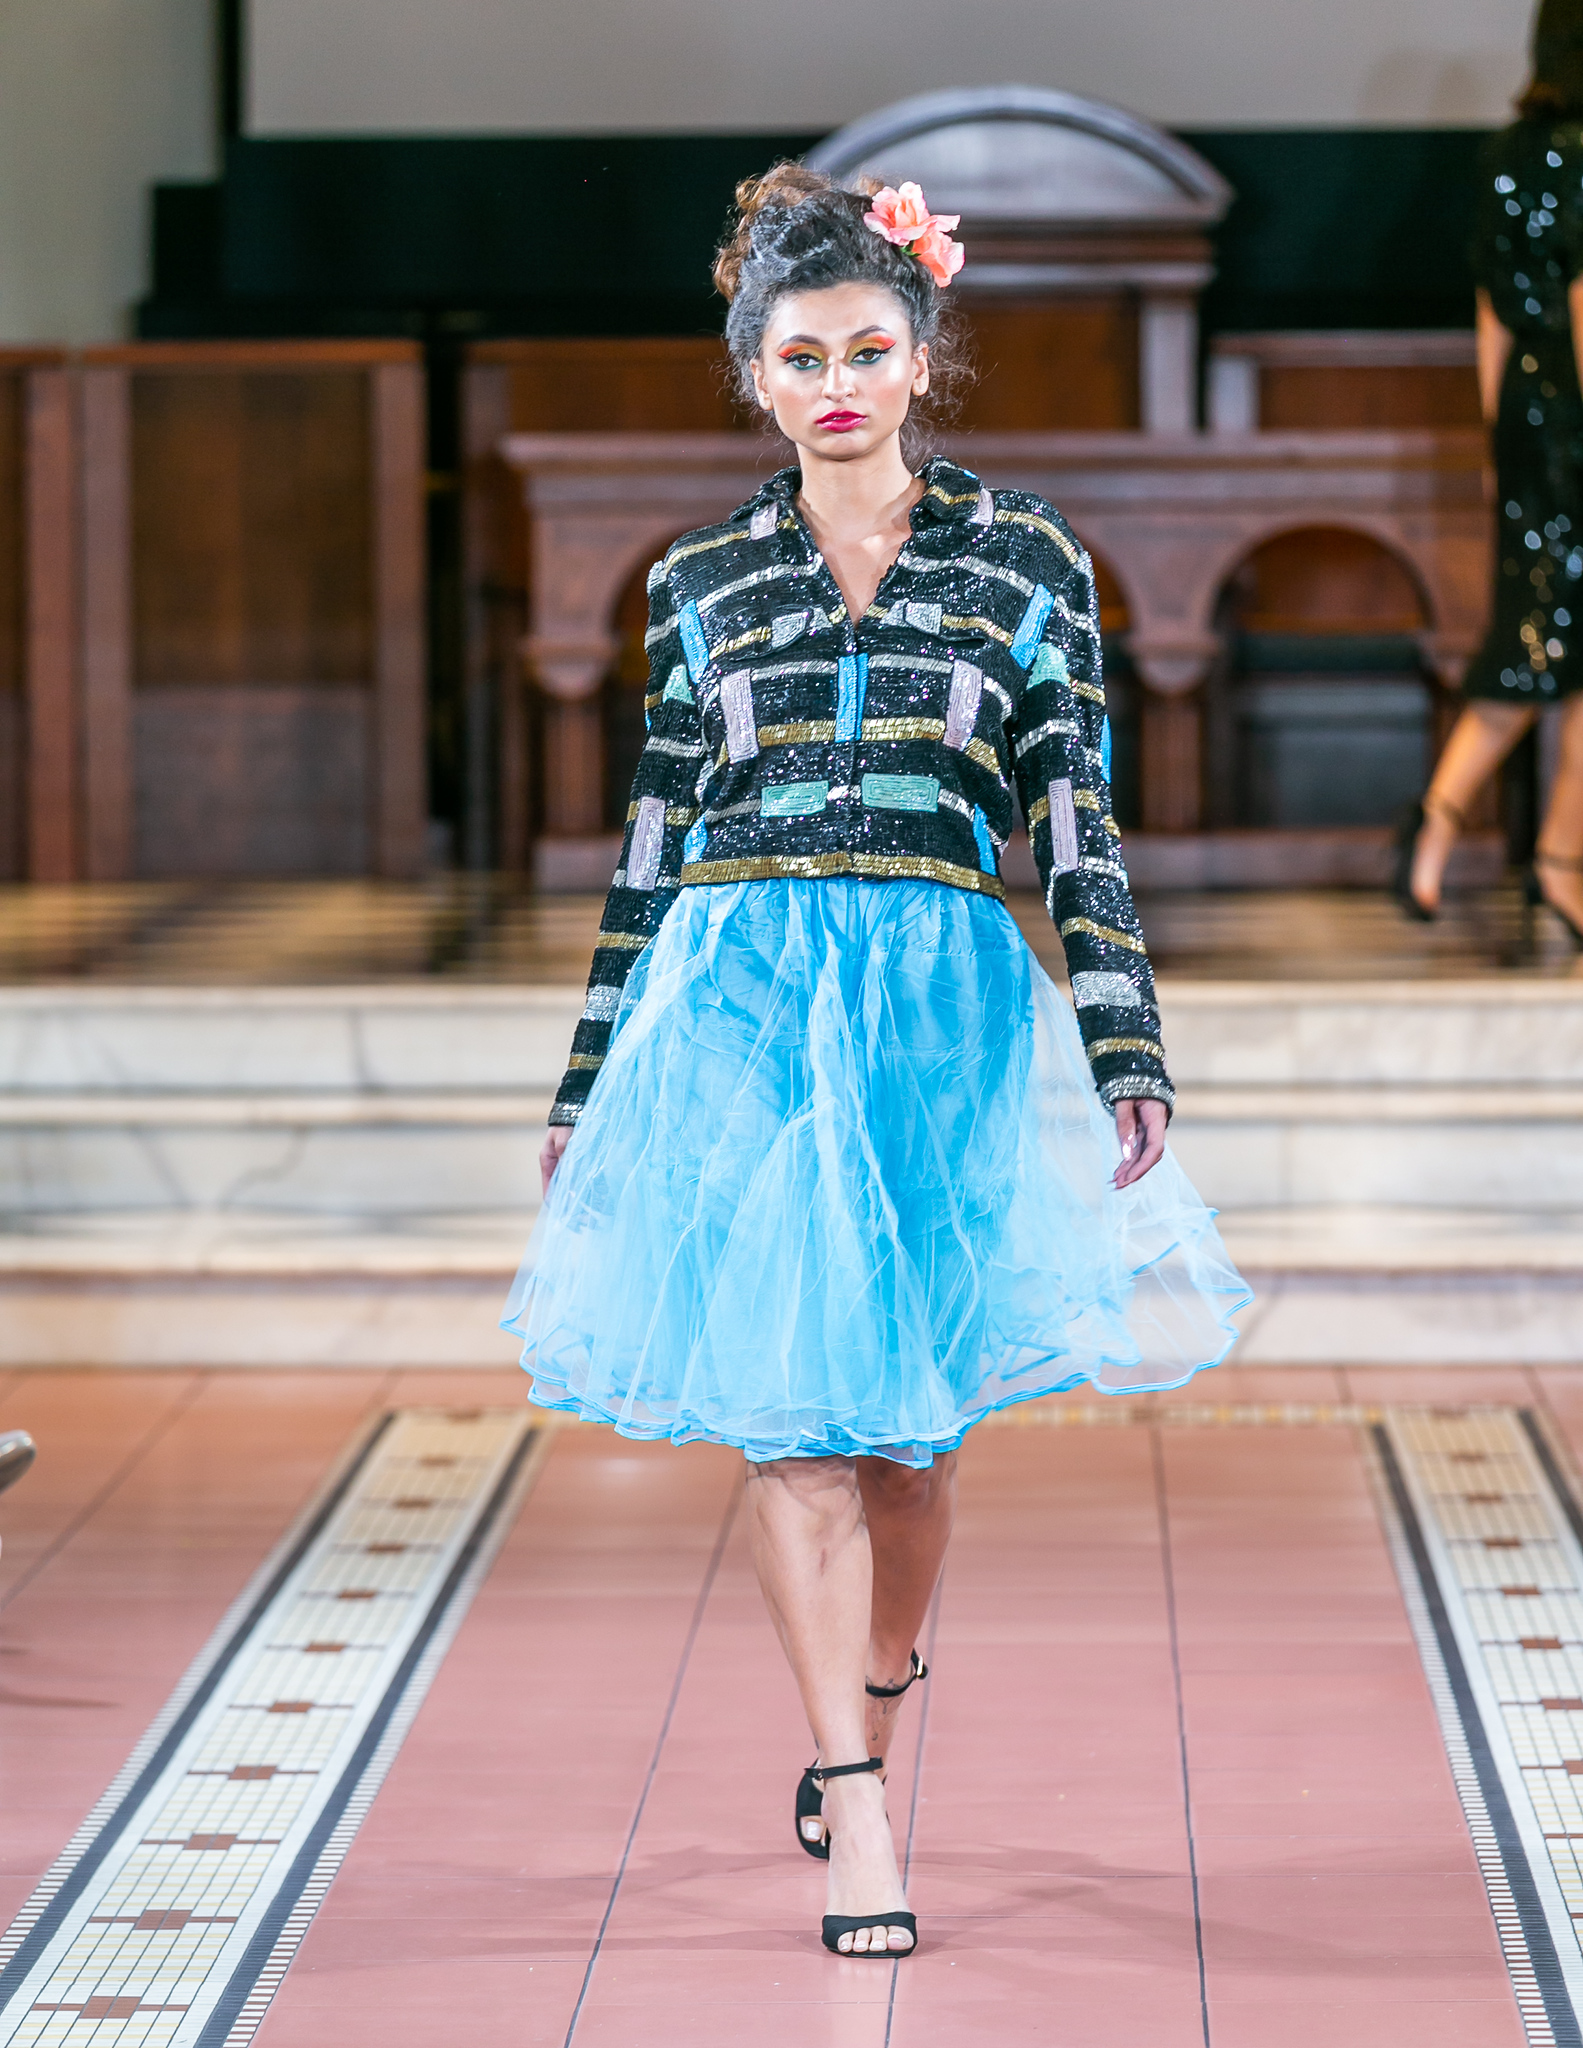 fashion-sizzle-boutique-showcases-beauty-fashion-week-2019-2